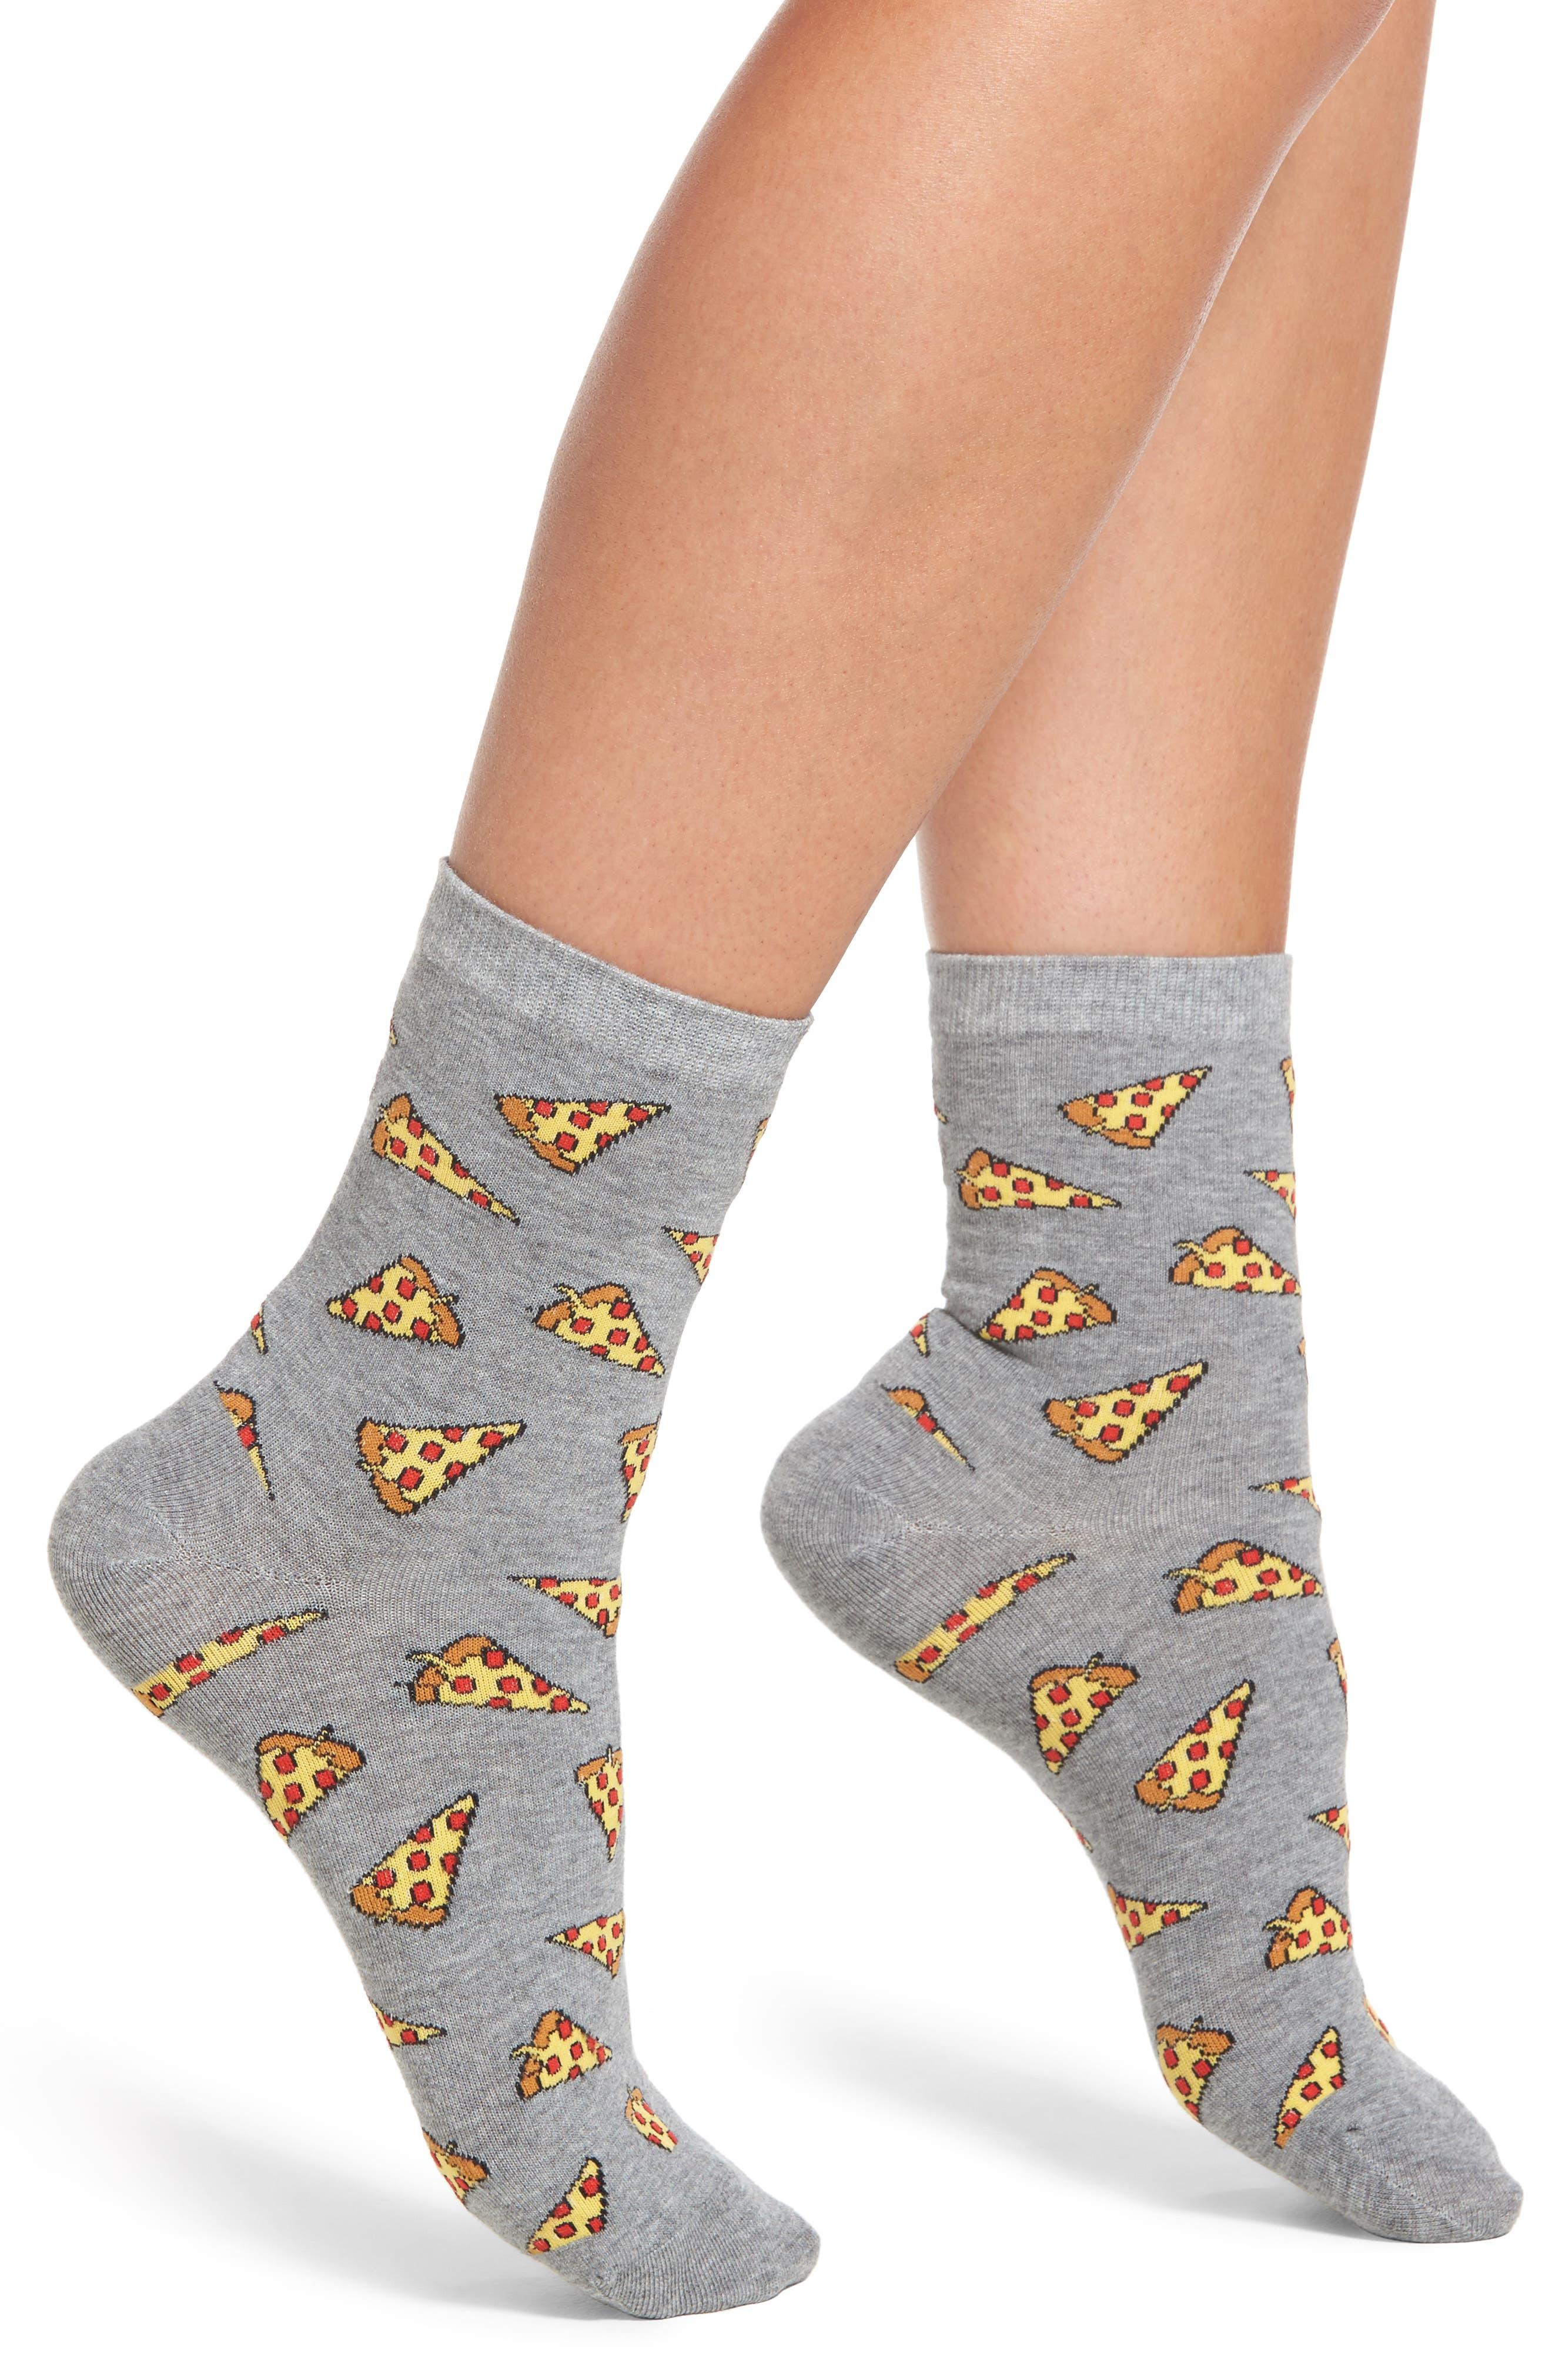 SOCKART Pizza Ankle Socks, Main, color, 060